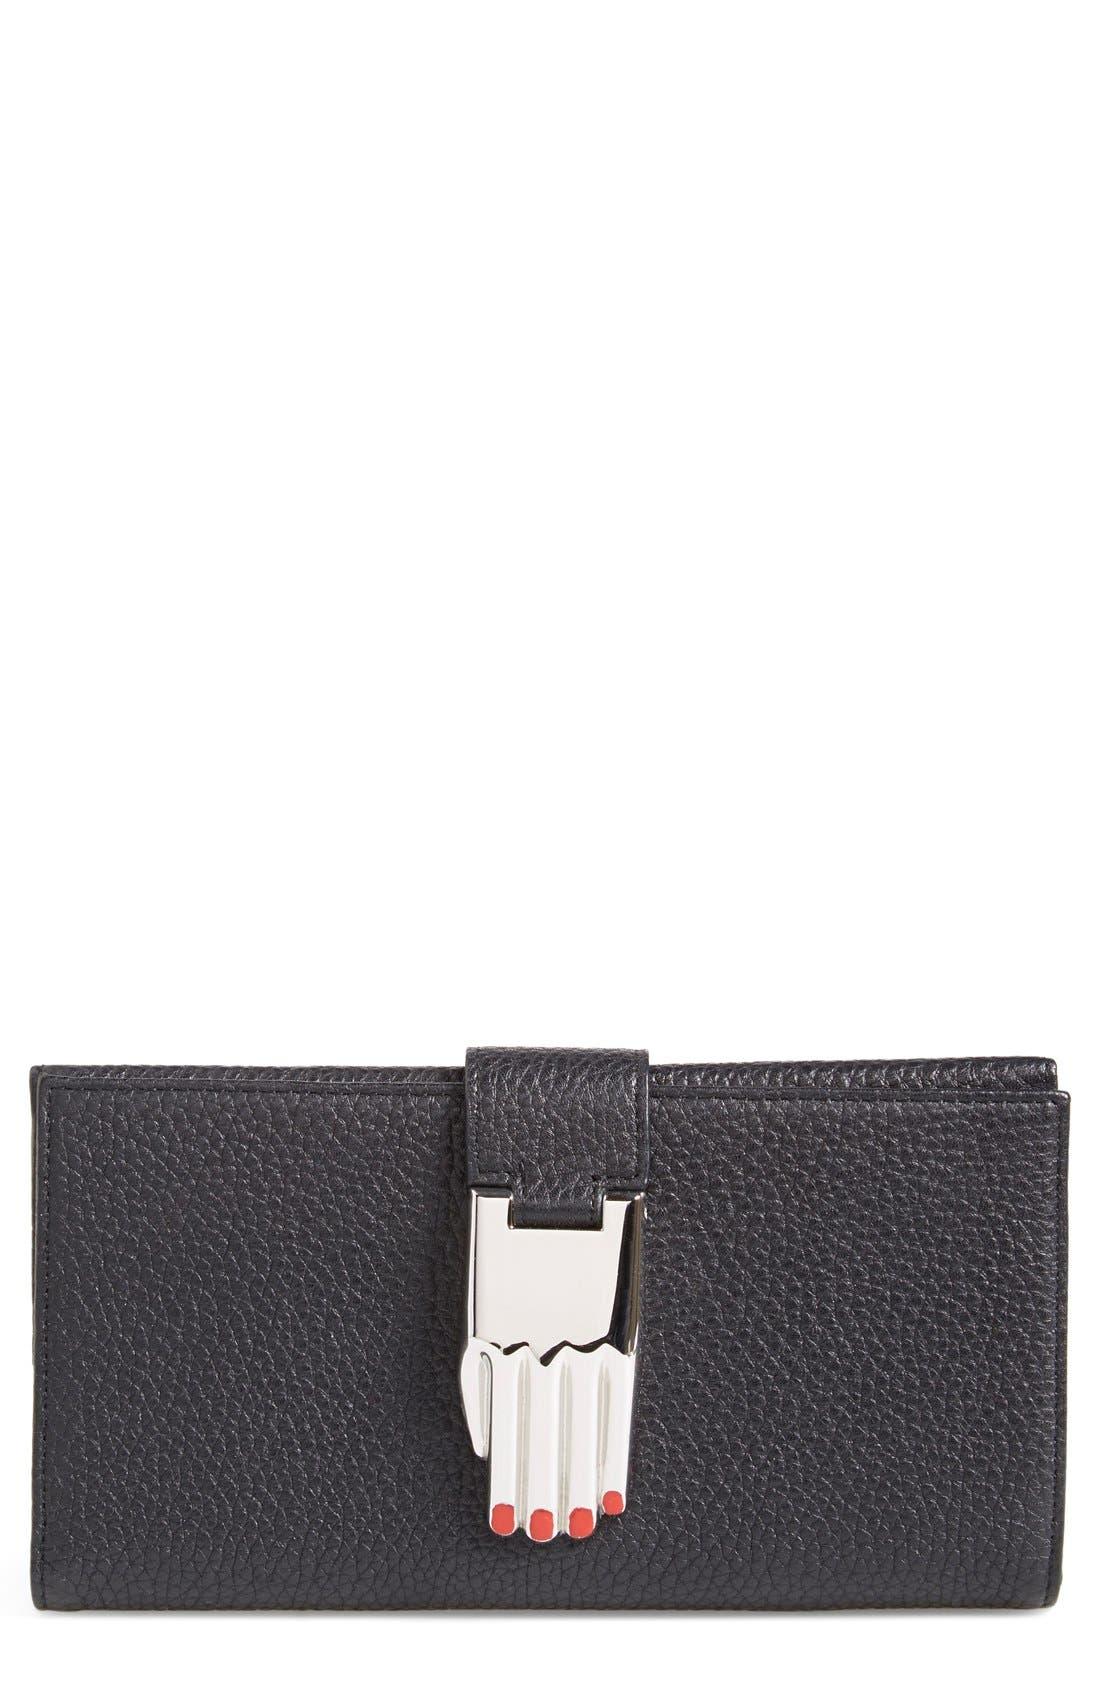 Main Image - Opening Ceremony 'Misha' Leather Wallet